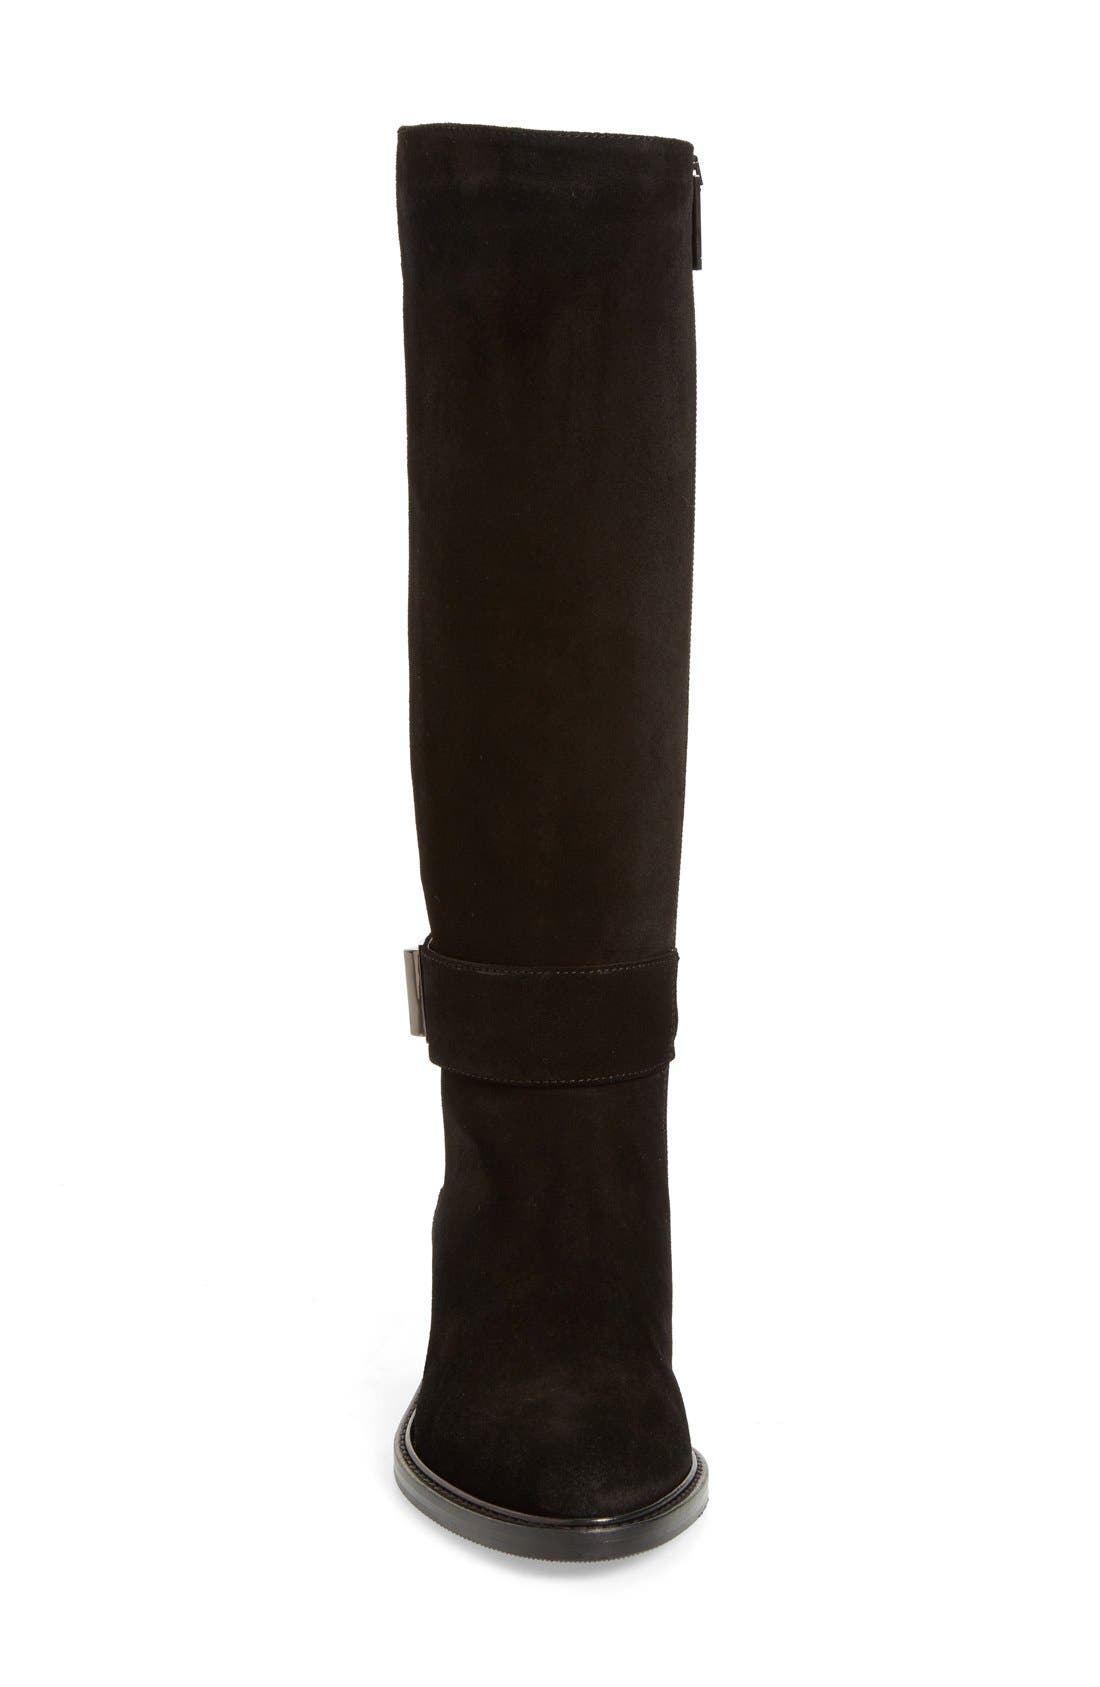 Alternate Image 3  - Aquatalia 'Giada' Weatherproof Riding Boot (Women)